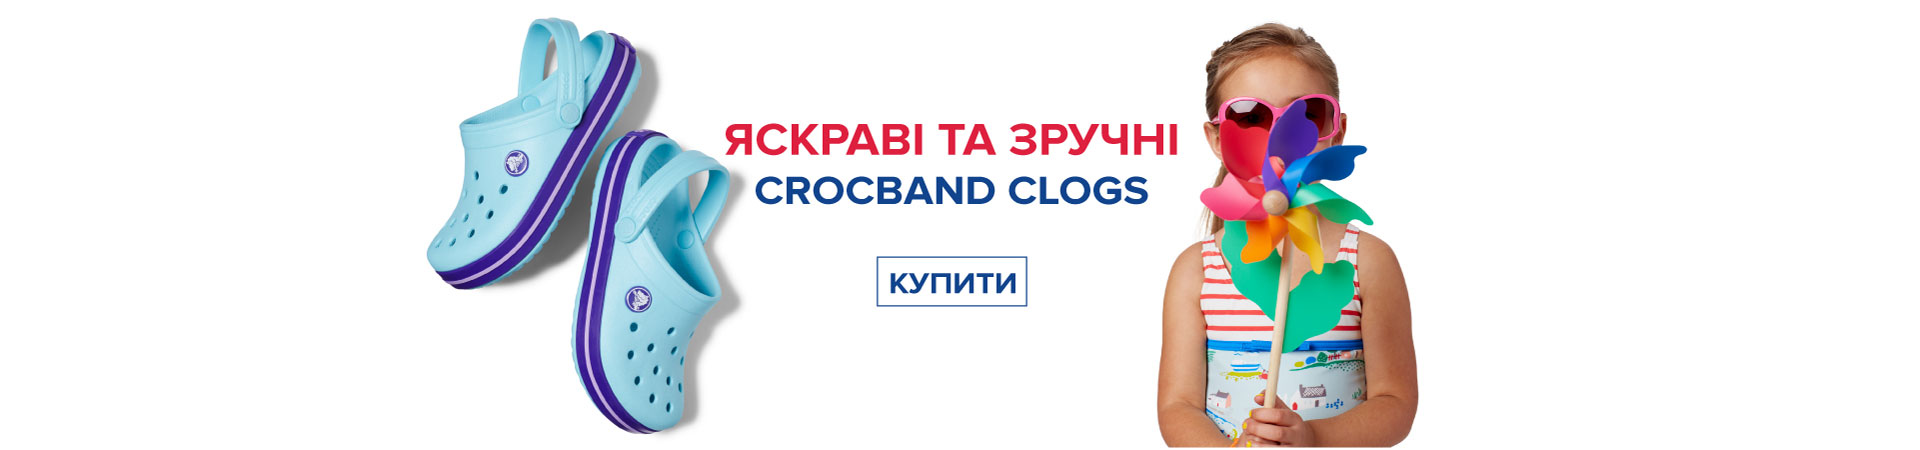 Crocband™